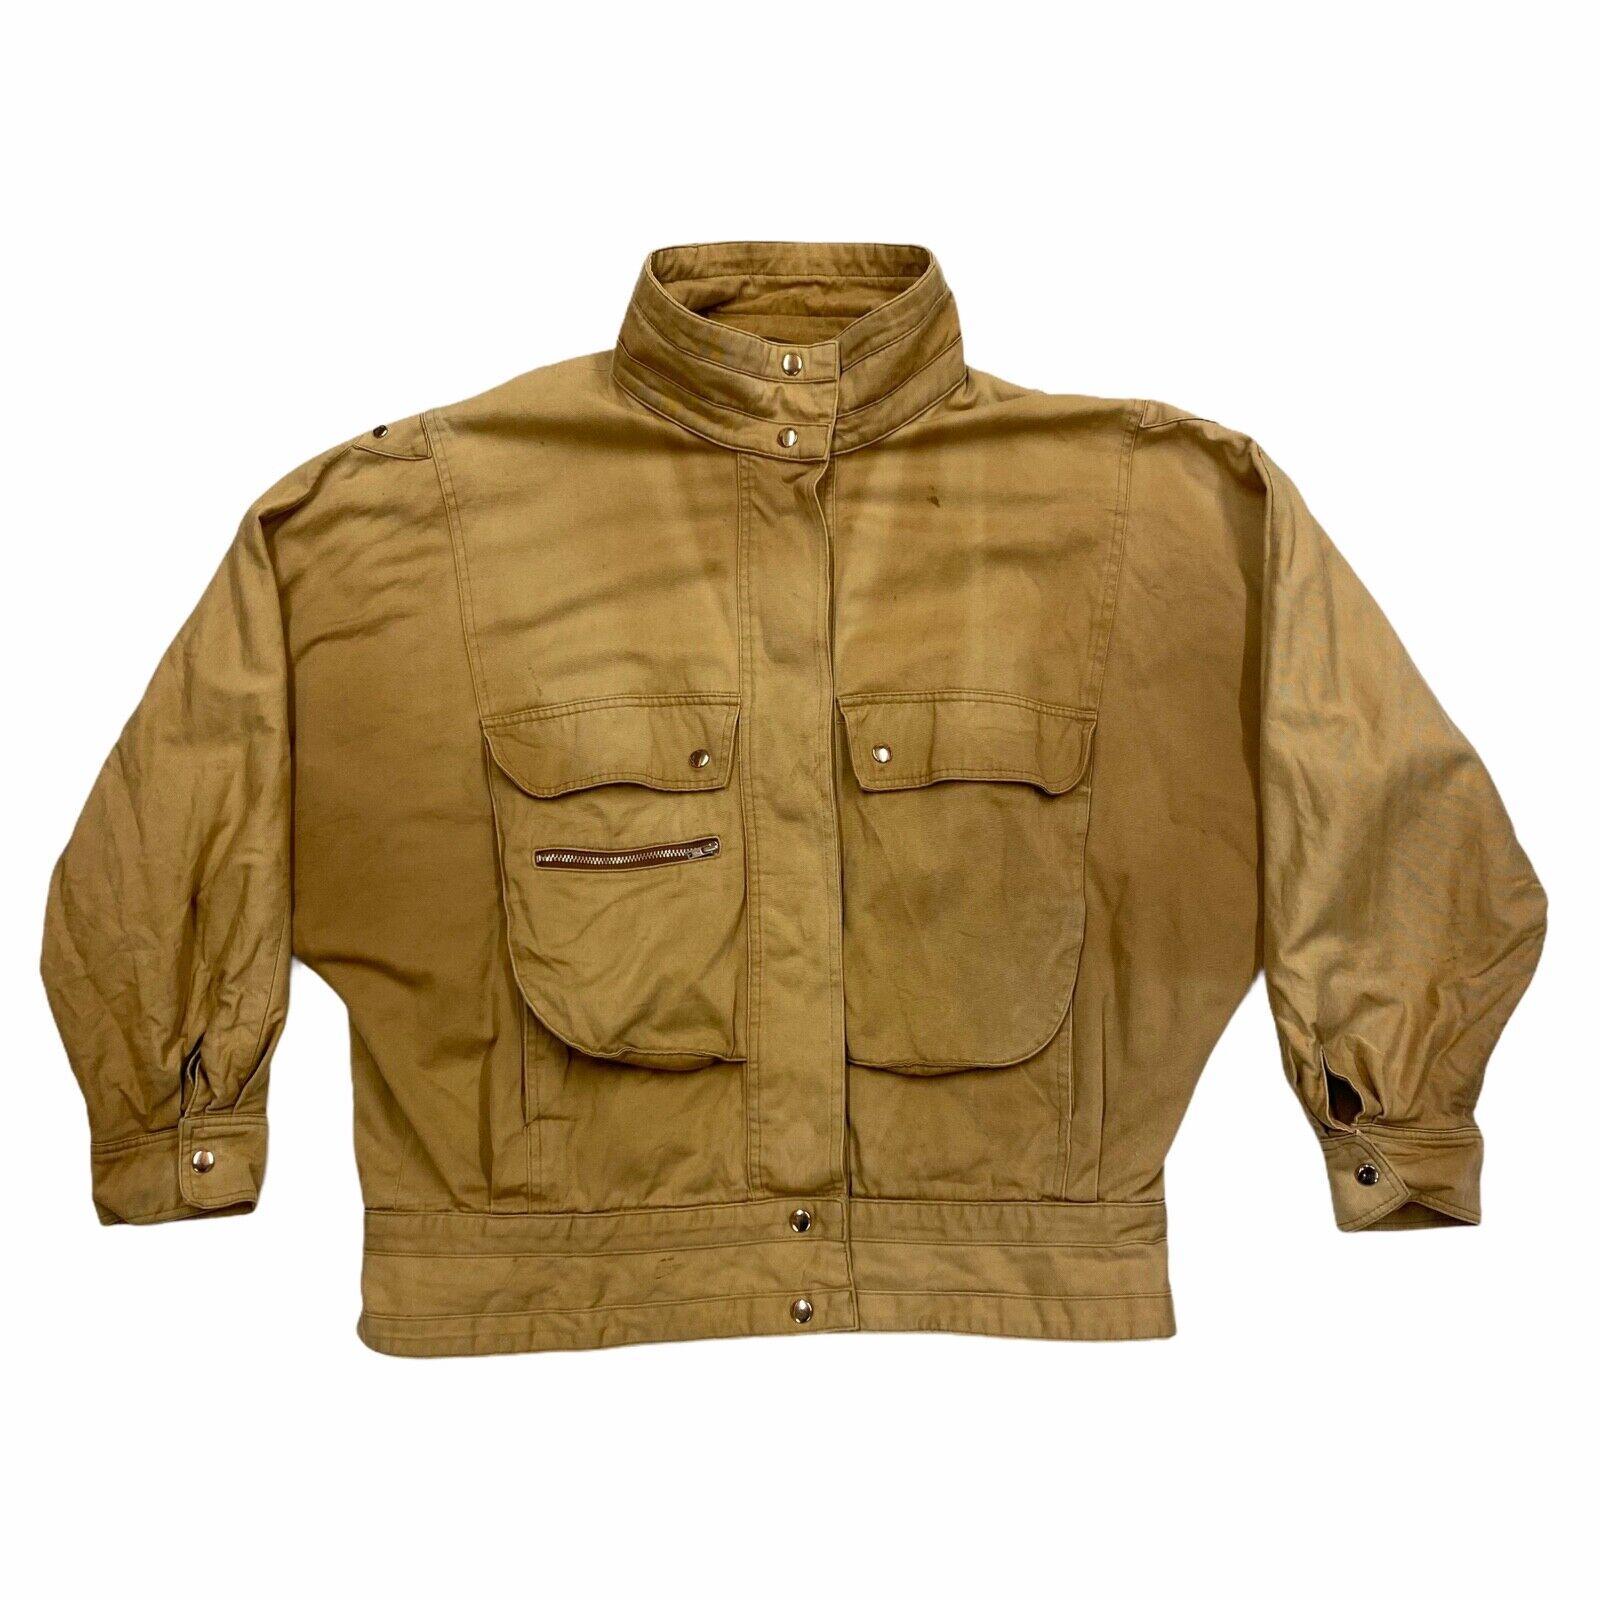 Betty Barclay Women's Cotton Jacket | Vintage High End Designer Tan Brown VTG